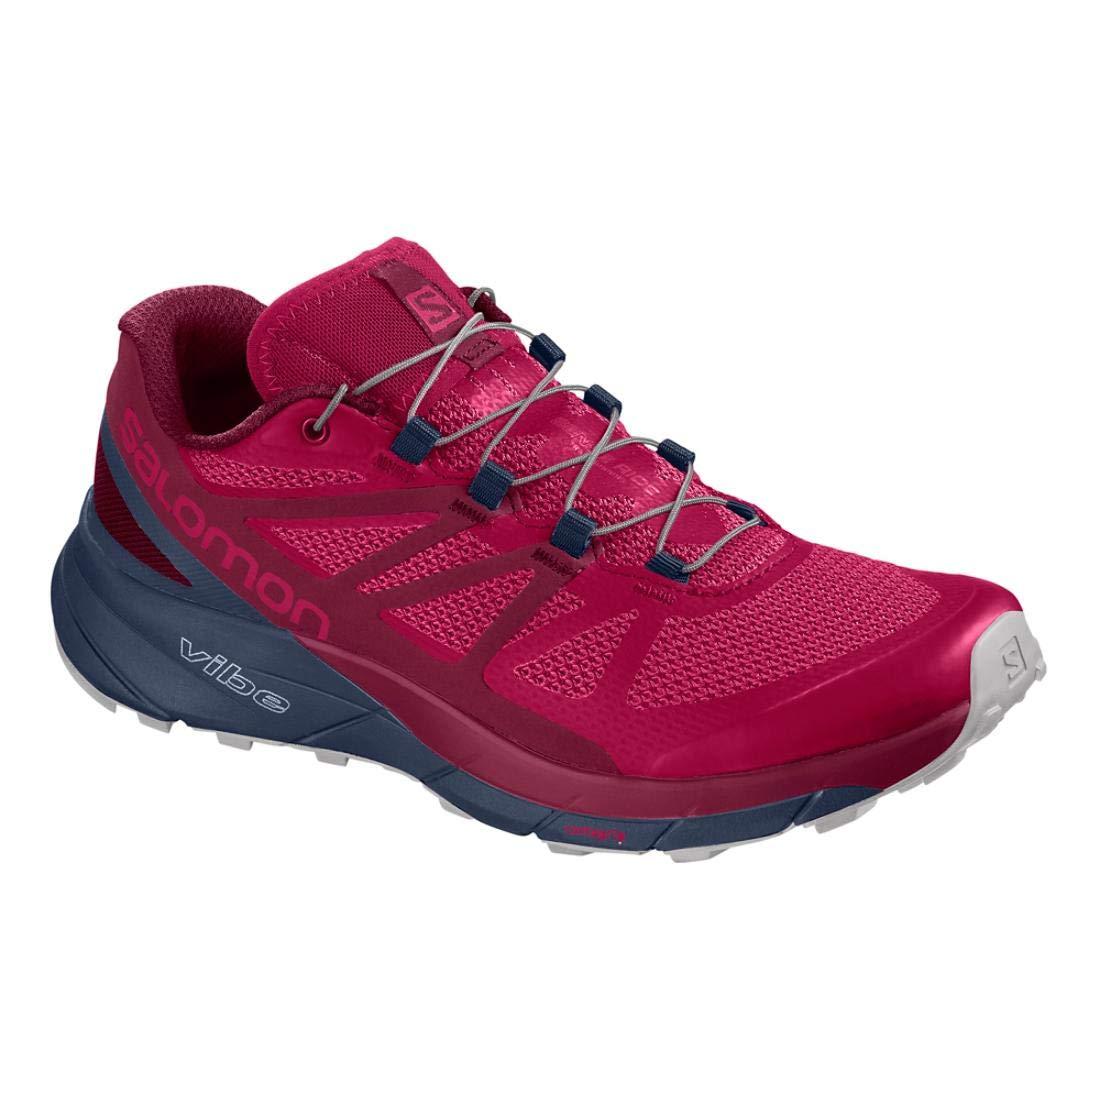 Salomon Women's Sense Ride Running Trail Shoes Cerise/Navy Blazer/Vapor Blue 5 by Salomon (Image #1)